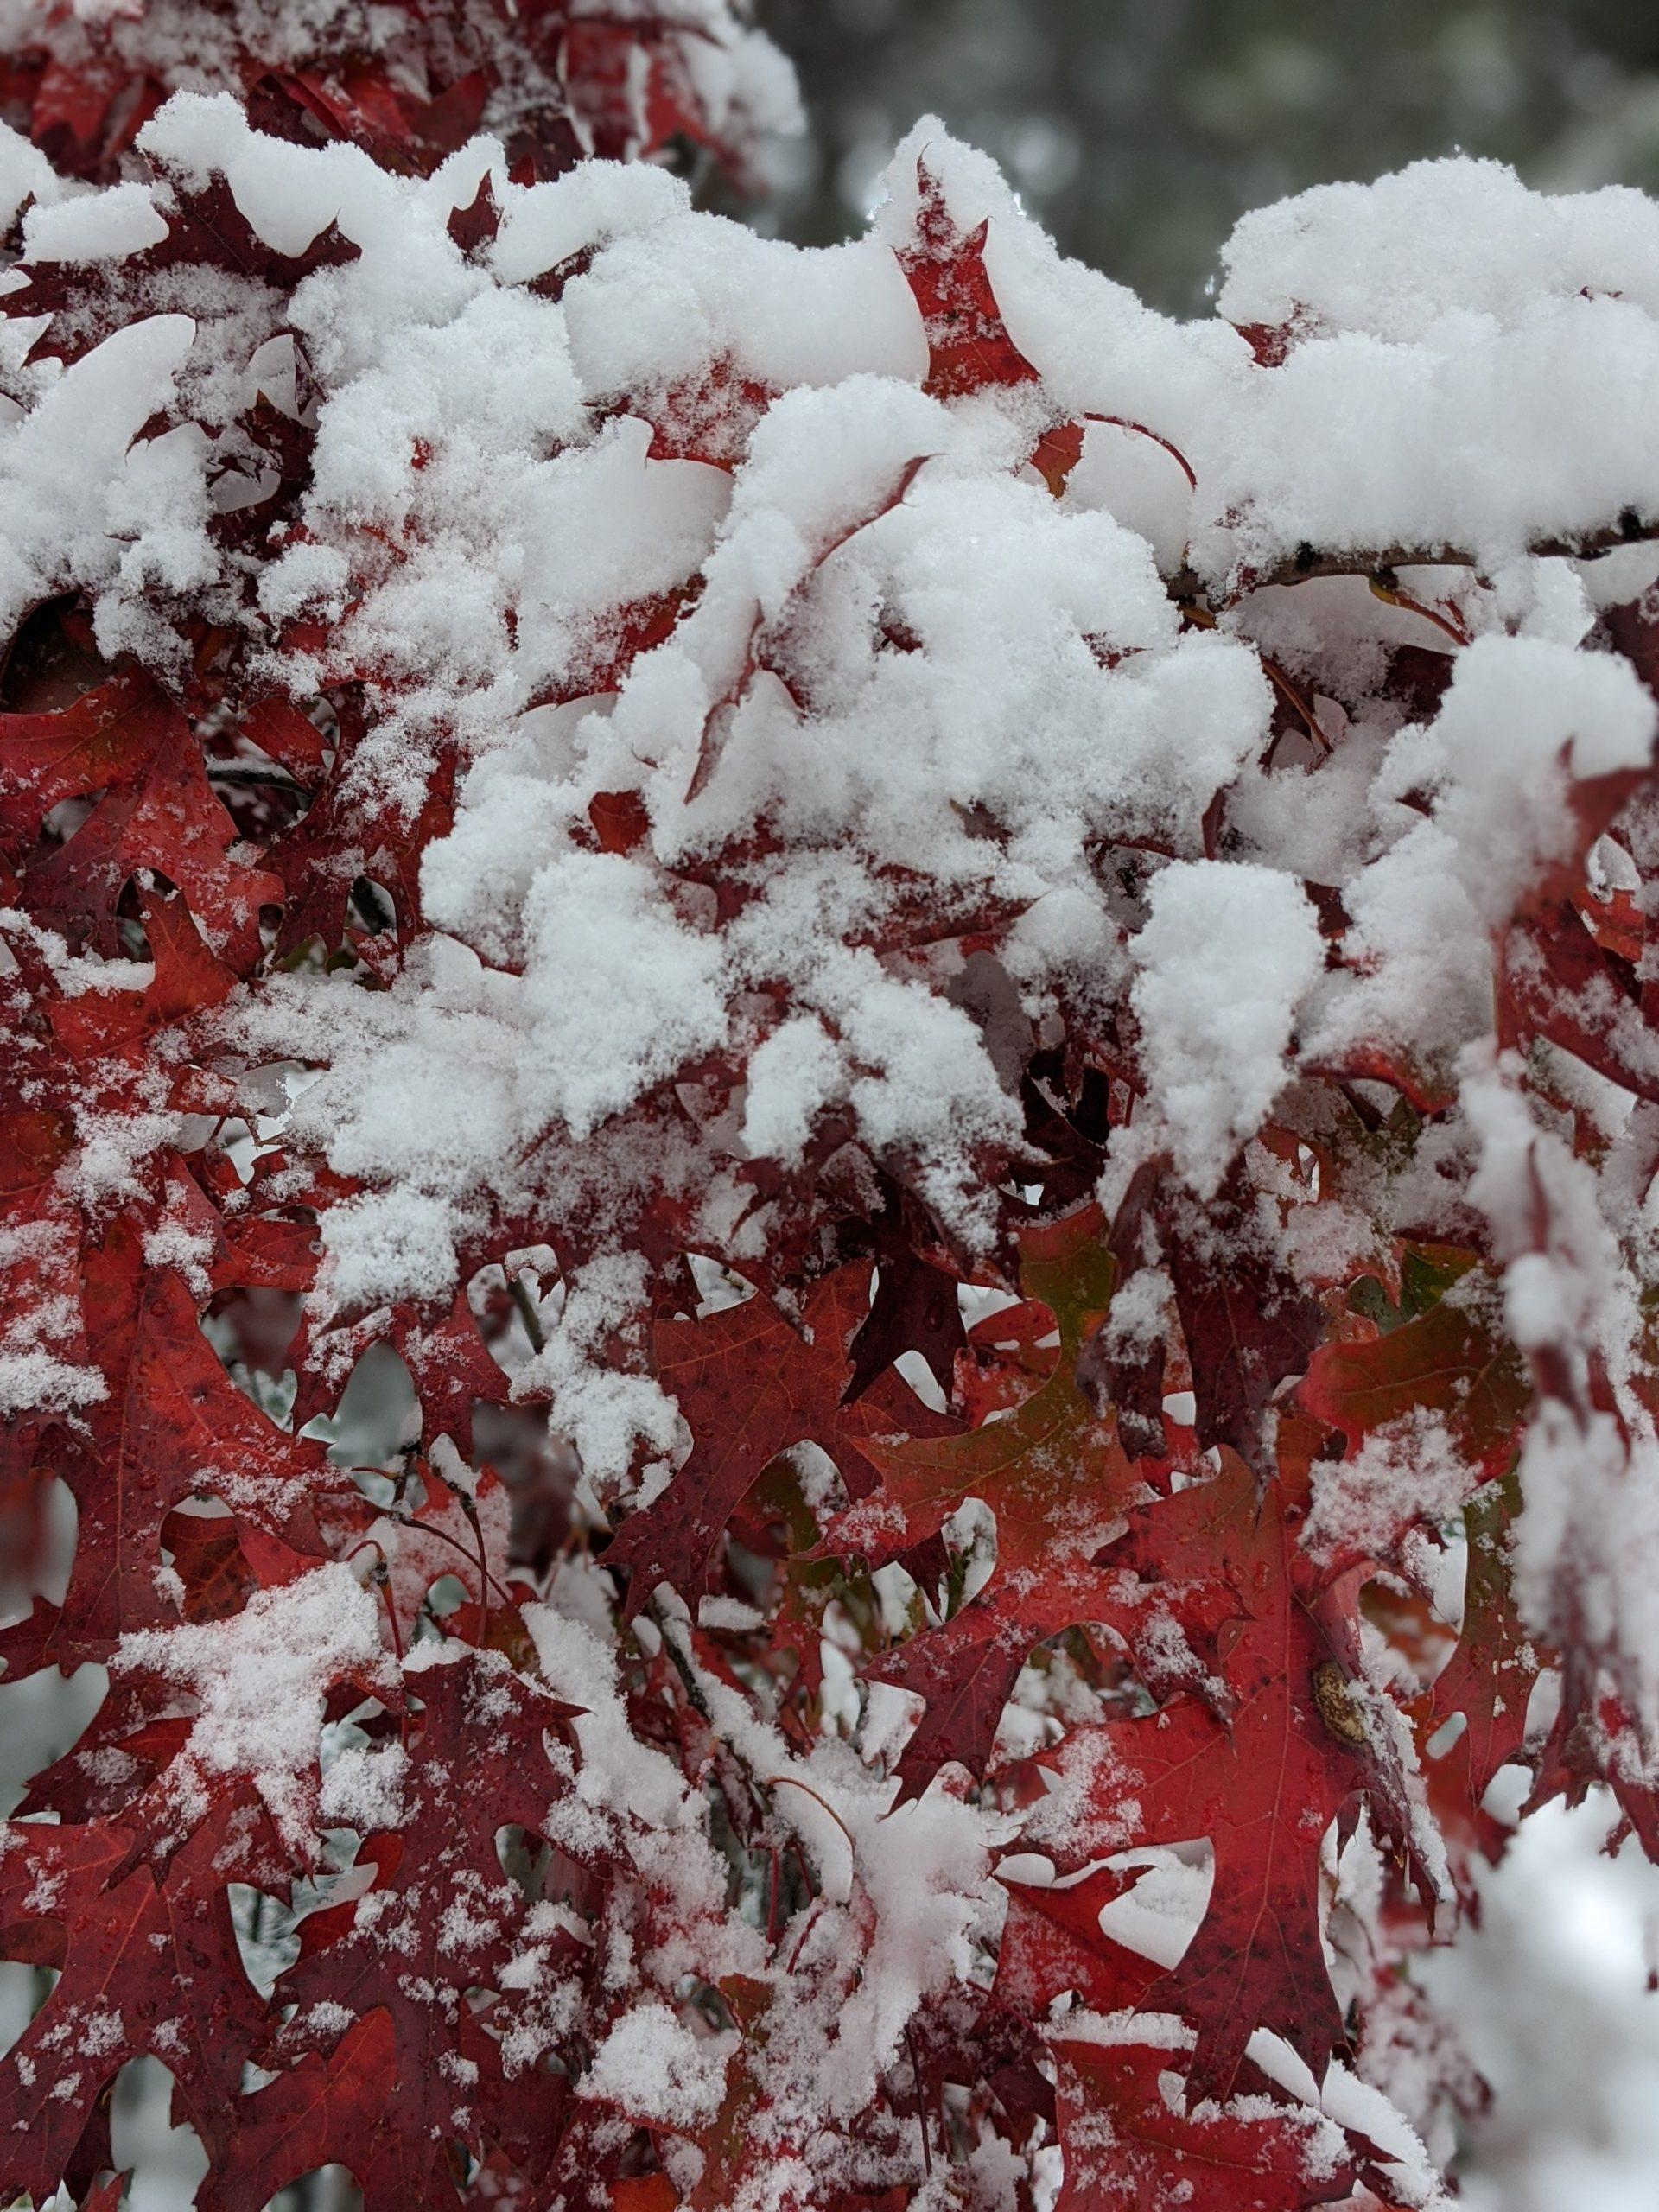 Snow on red oak leaves October 2020